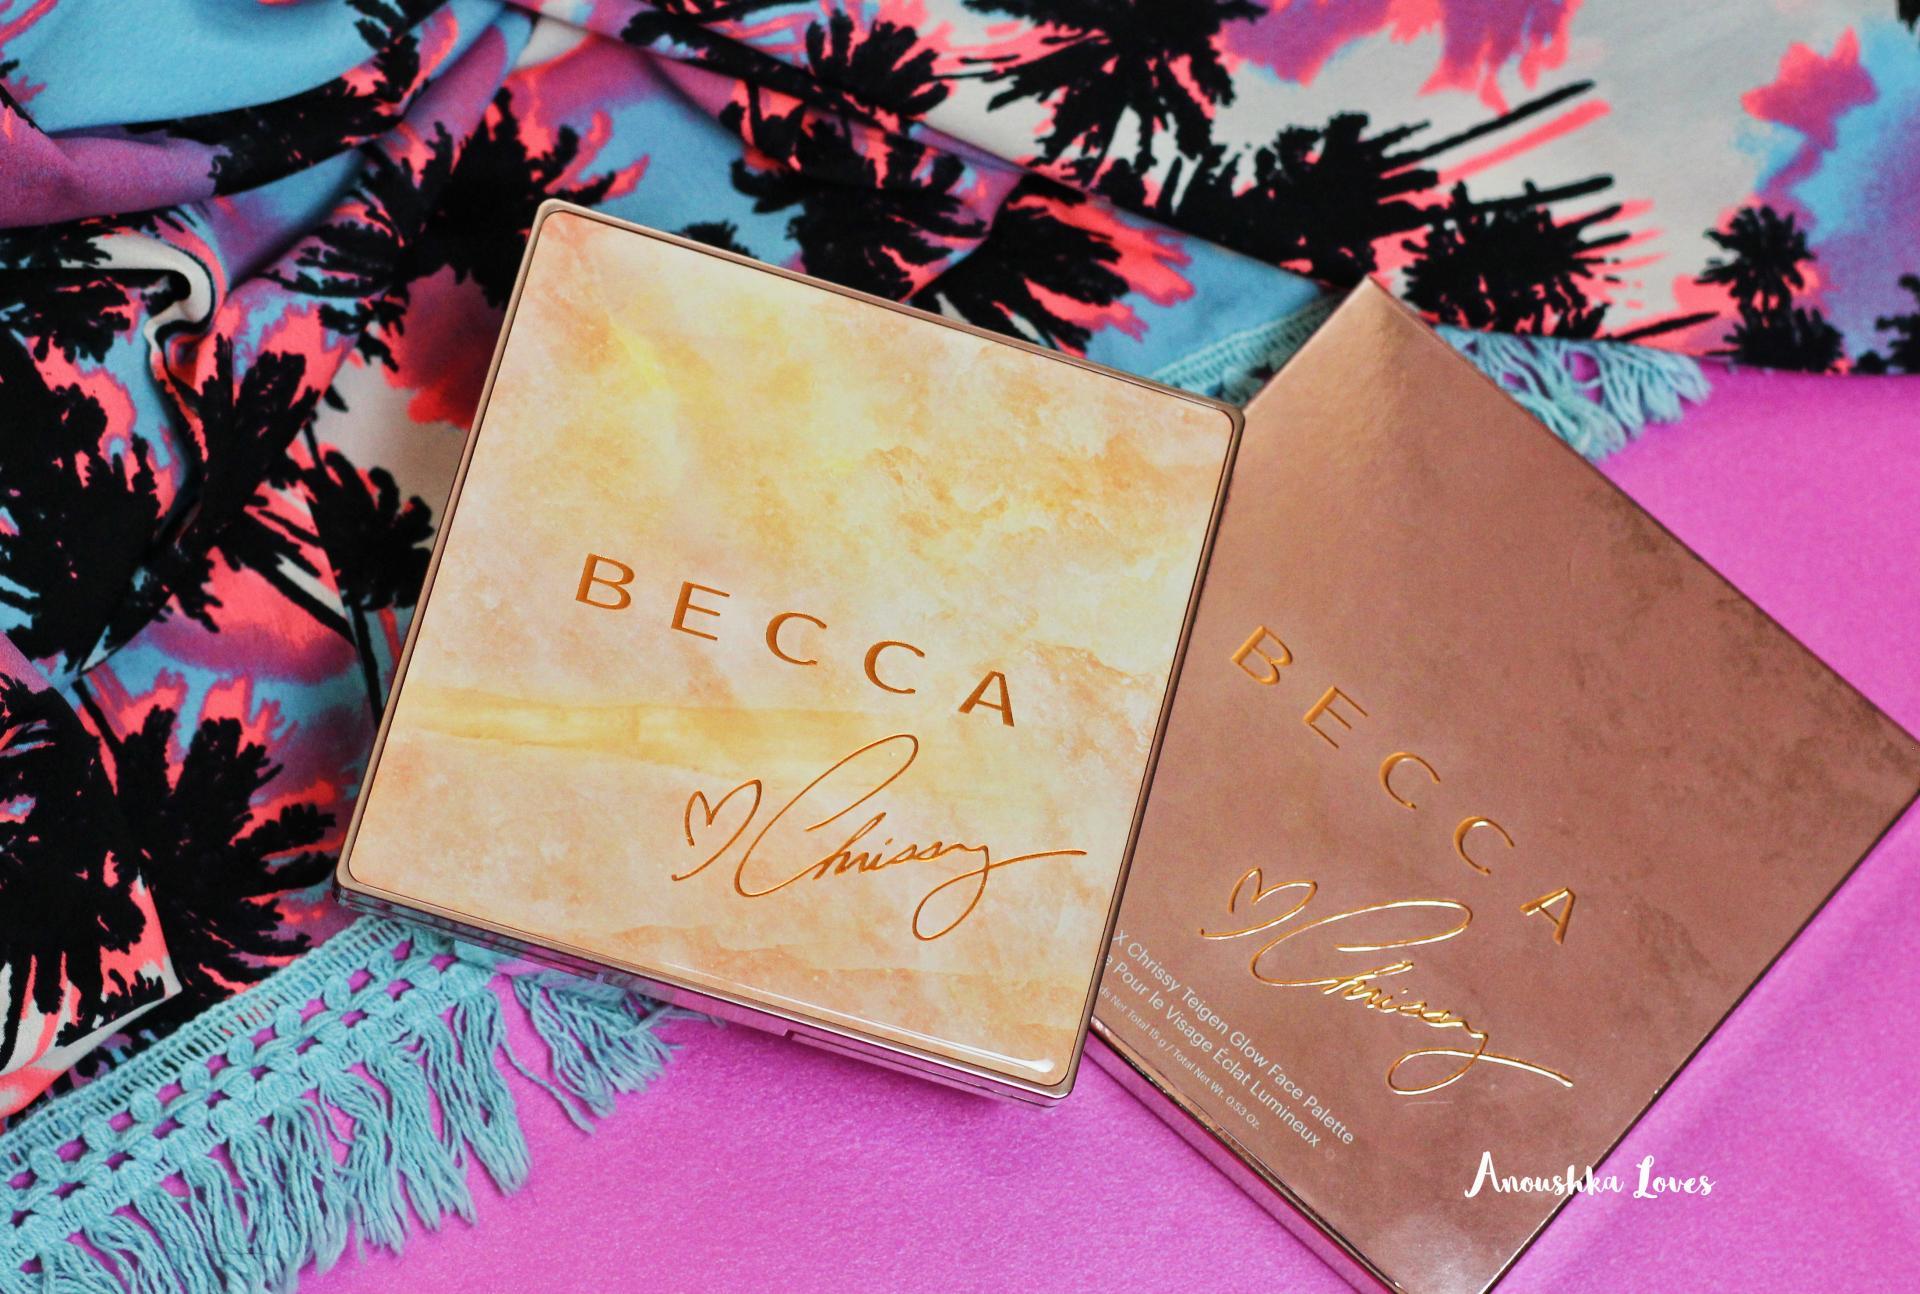 Becca x Chrissy Teigan Palette